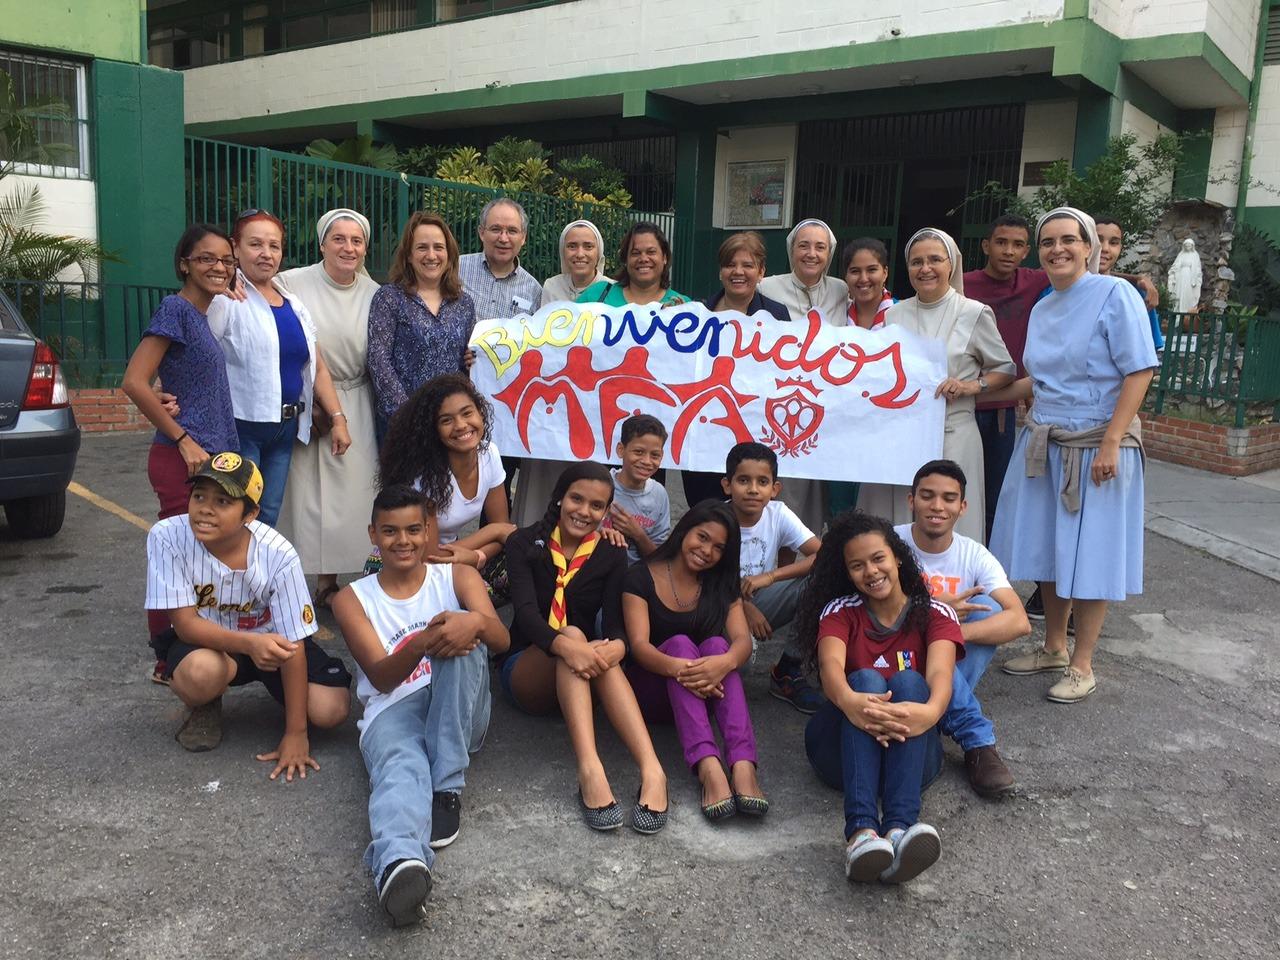 Mfa familia albertiana diario de viaje 2 caracas for Familia roca